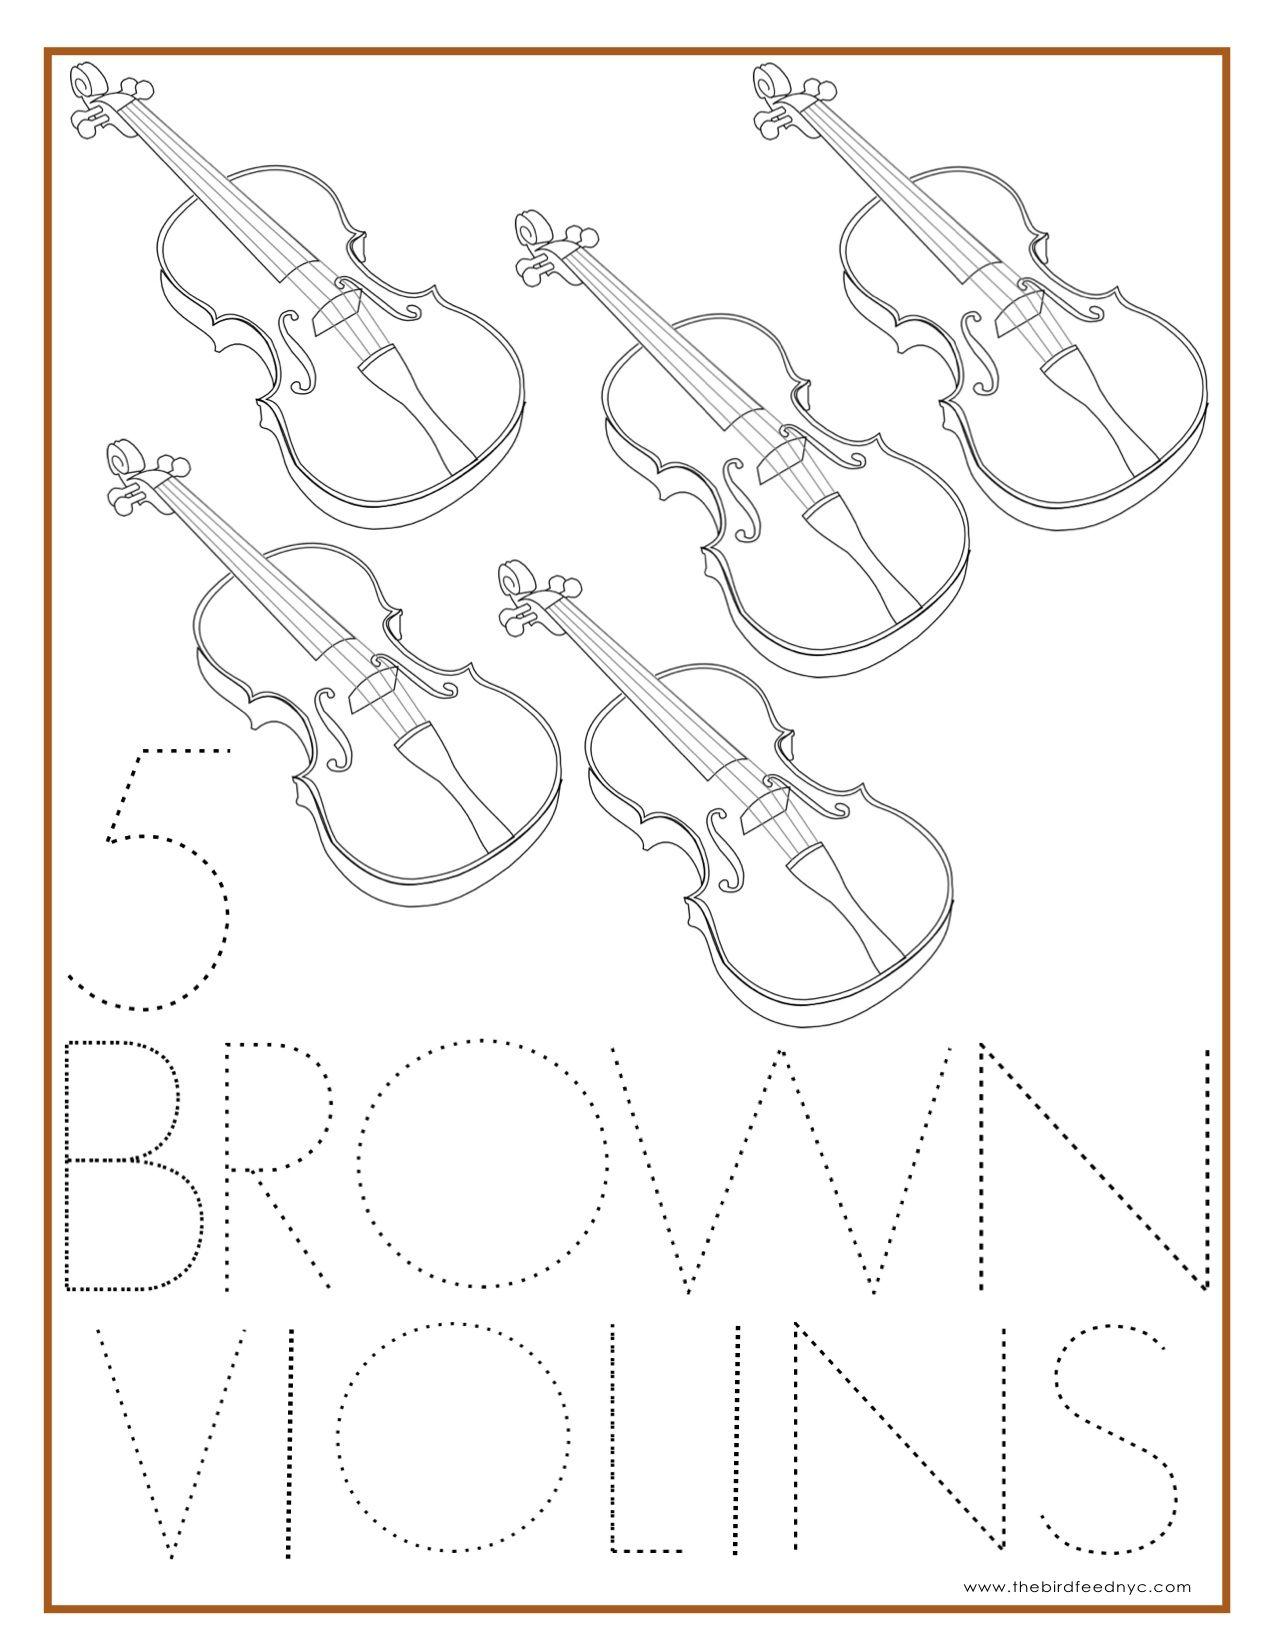 Number Coloring Sheet 5 Brown Violins